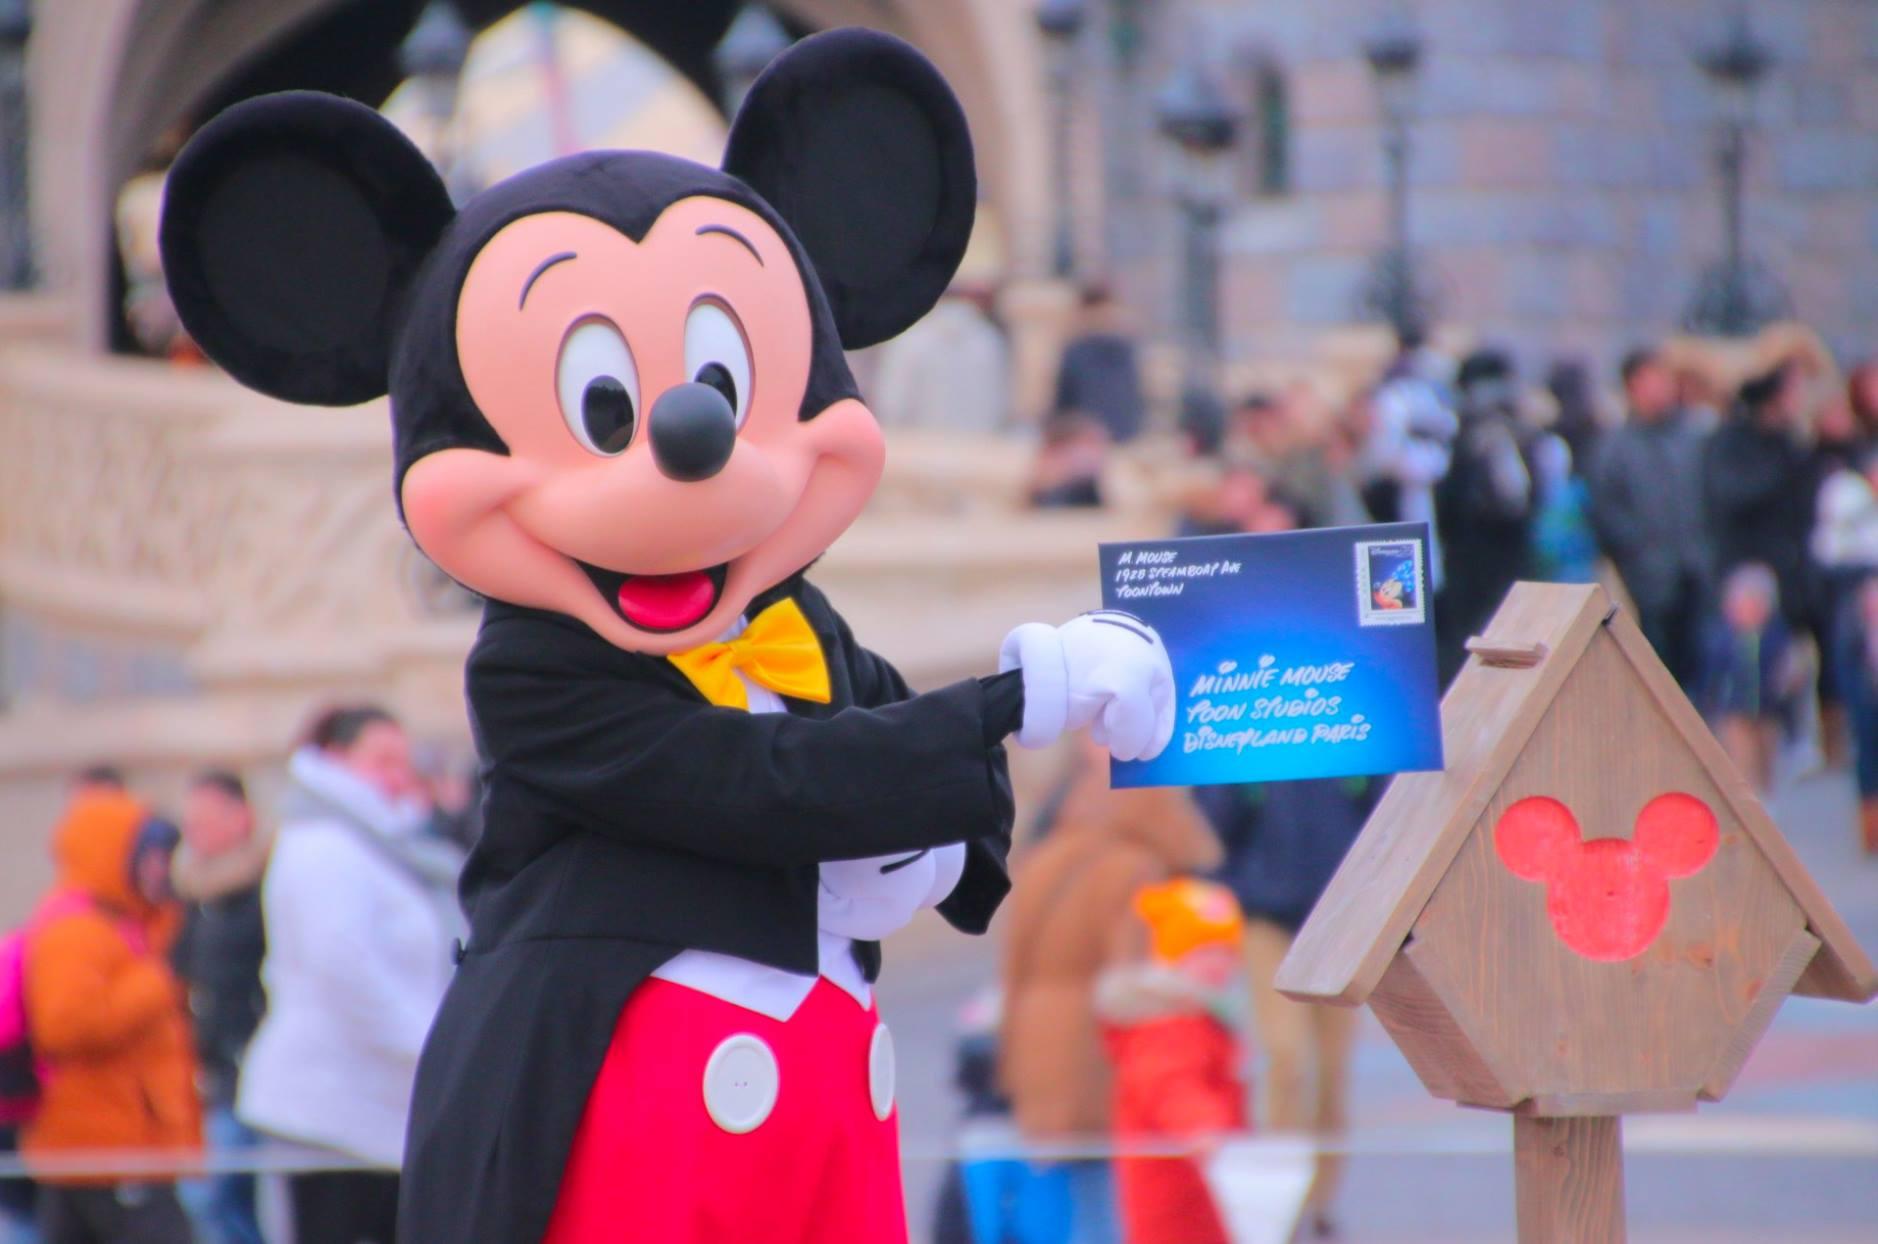 25° anniversario di Disneyland Paris - Pagina 6 000122